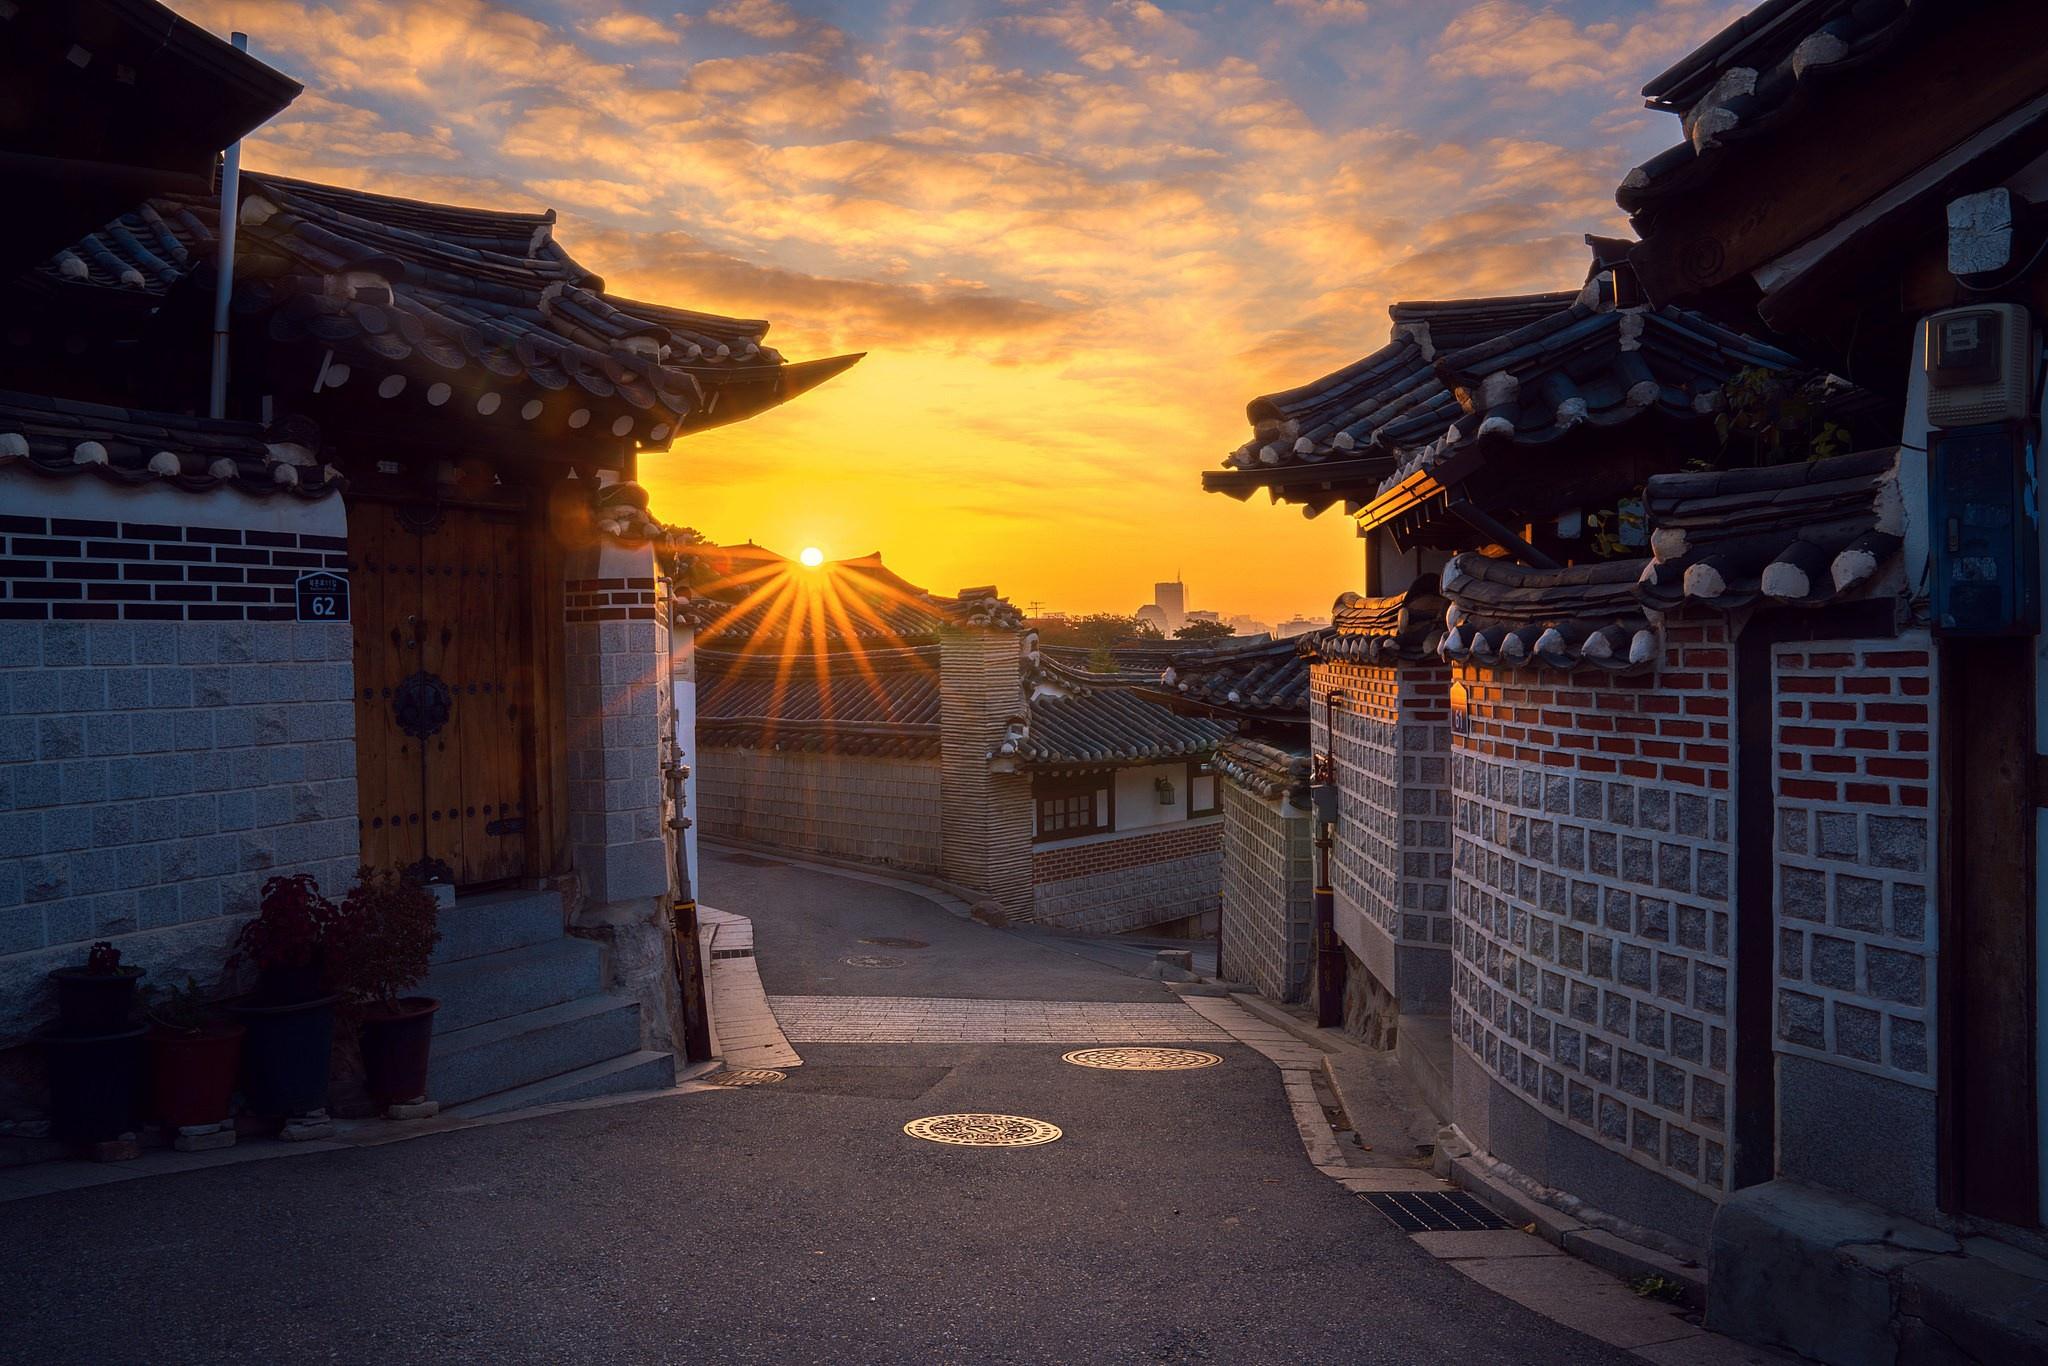 фото японский город утро меня дома